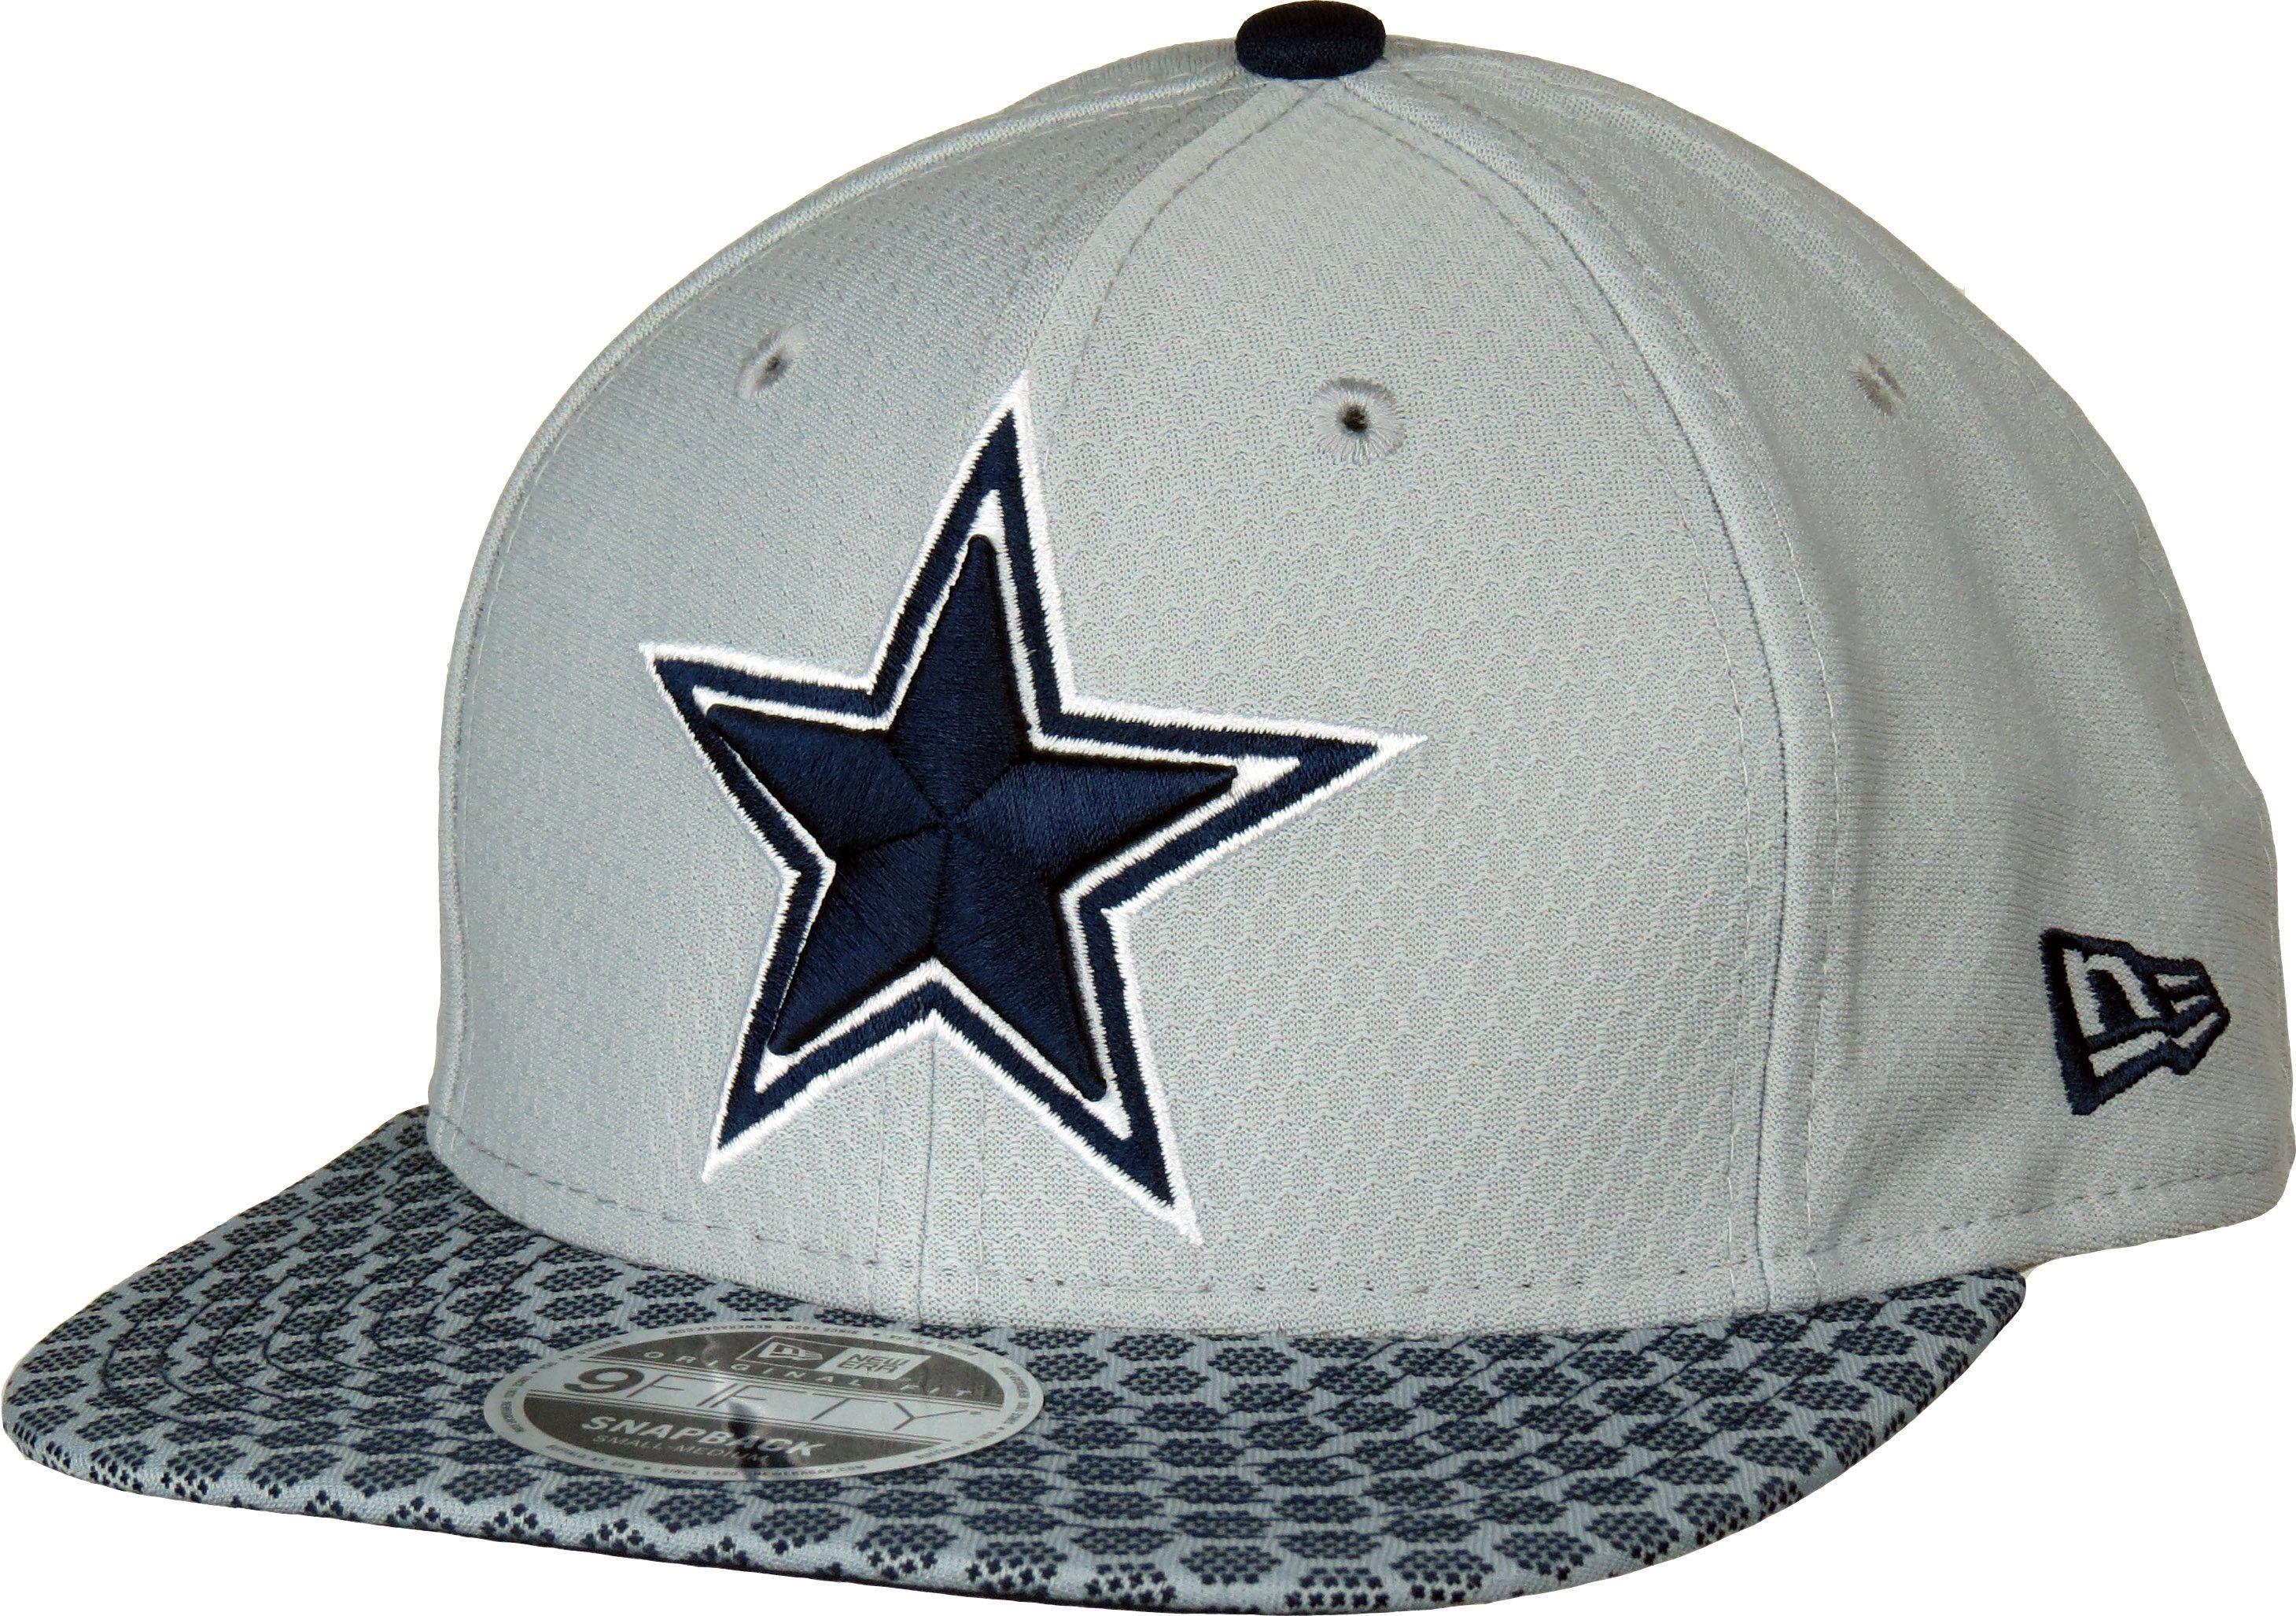 New Era 950 NFL Team On Field SL Snapback Cap. Grey performance fabric 3a751cb5c